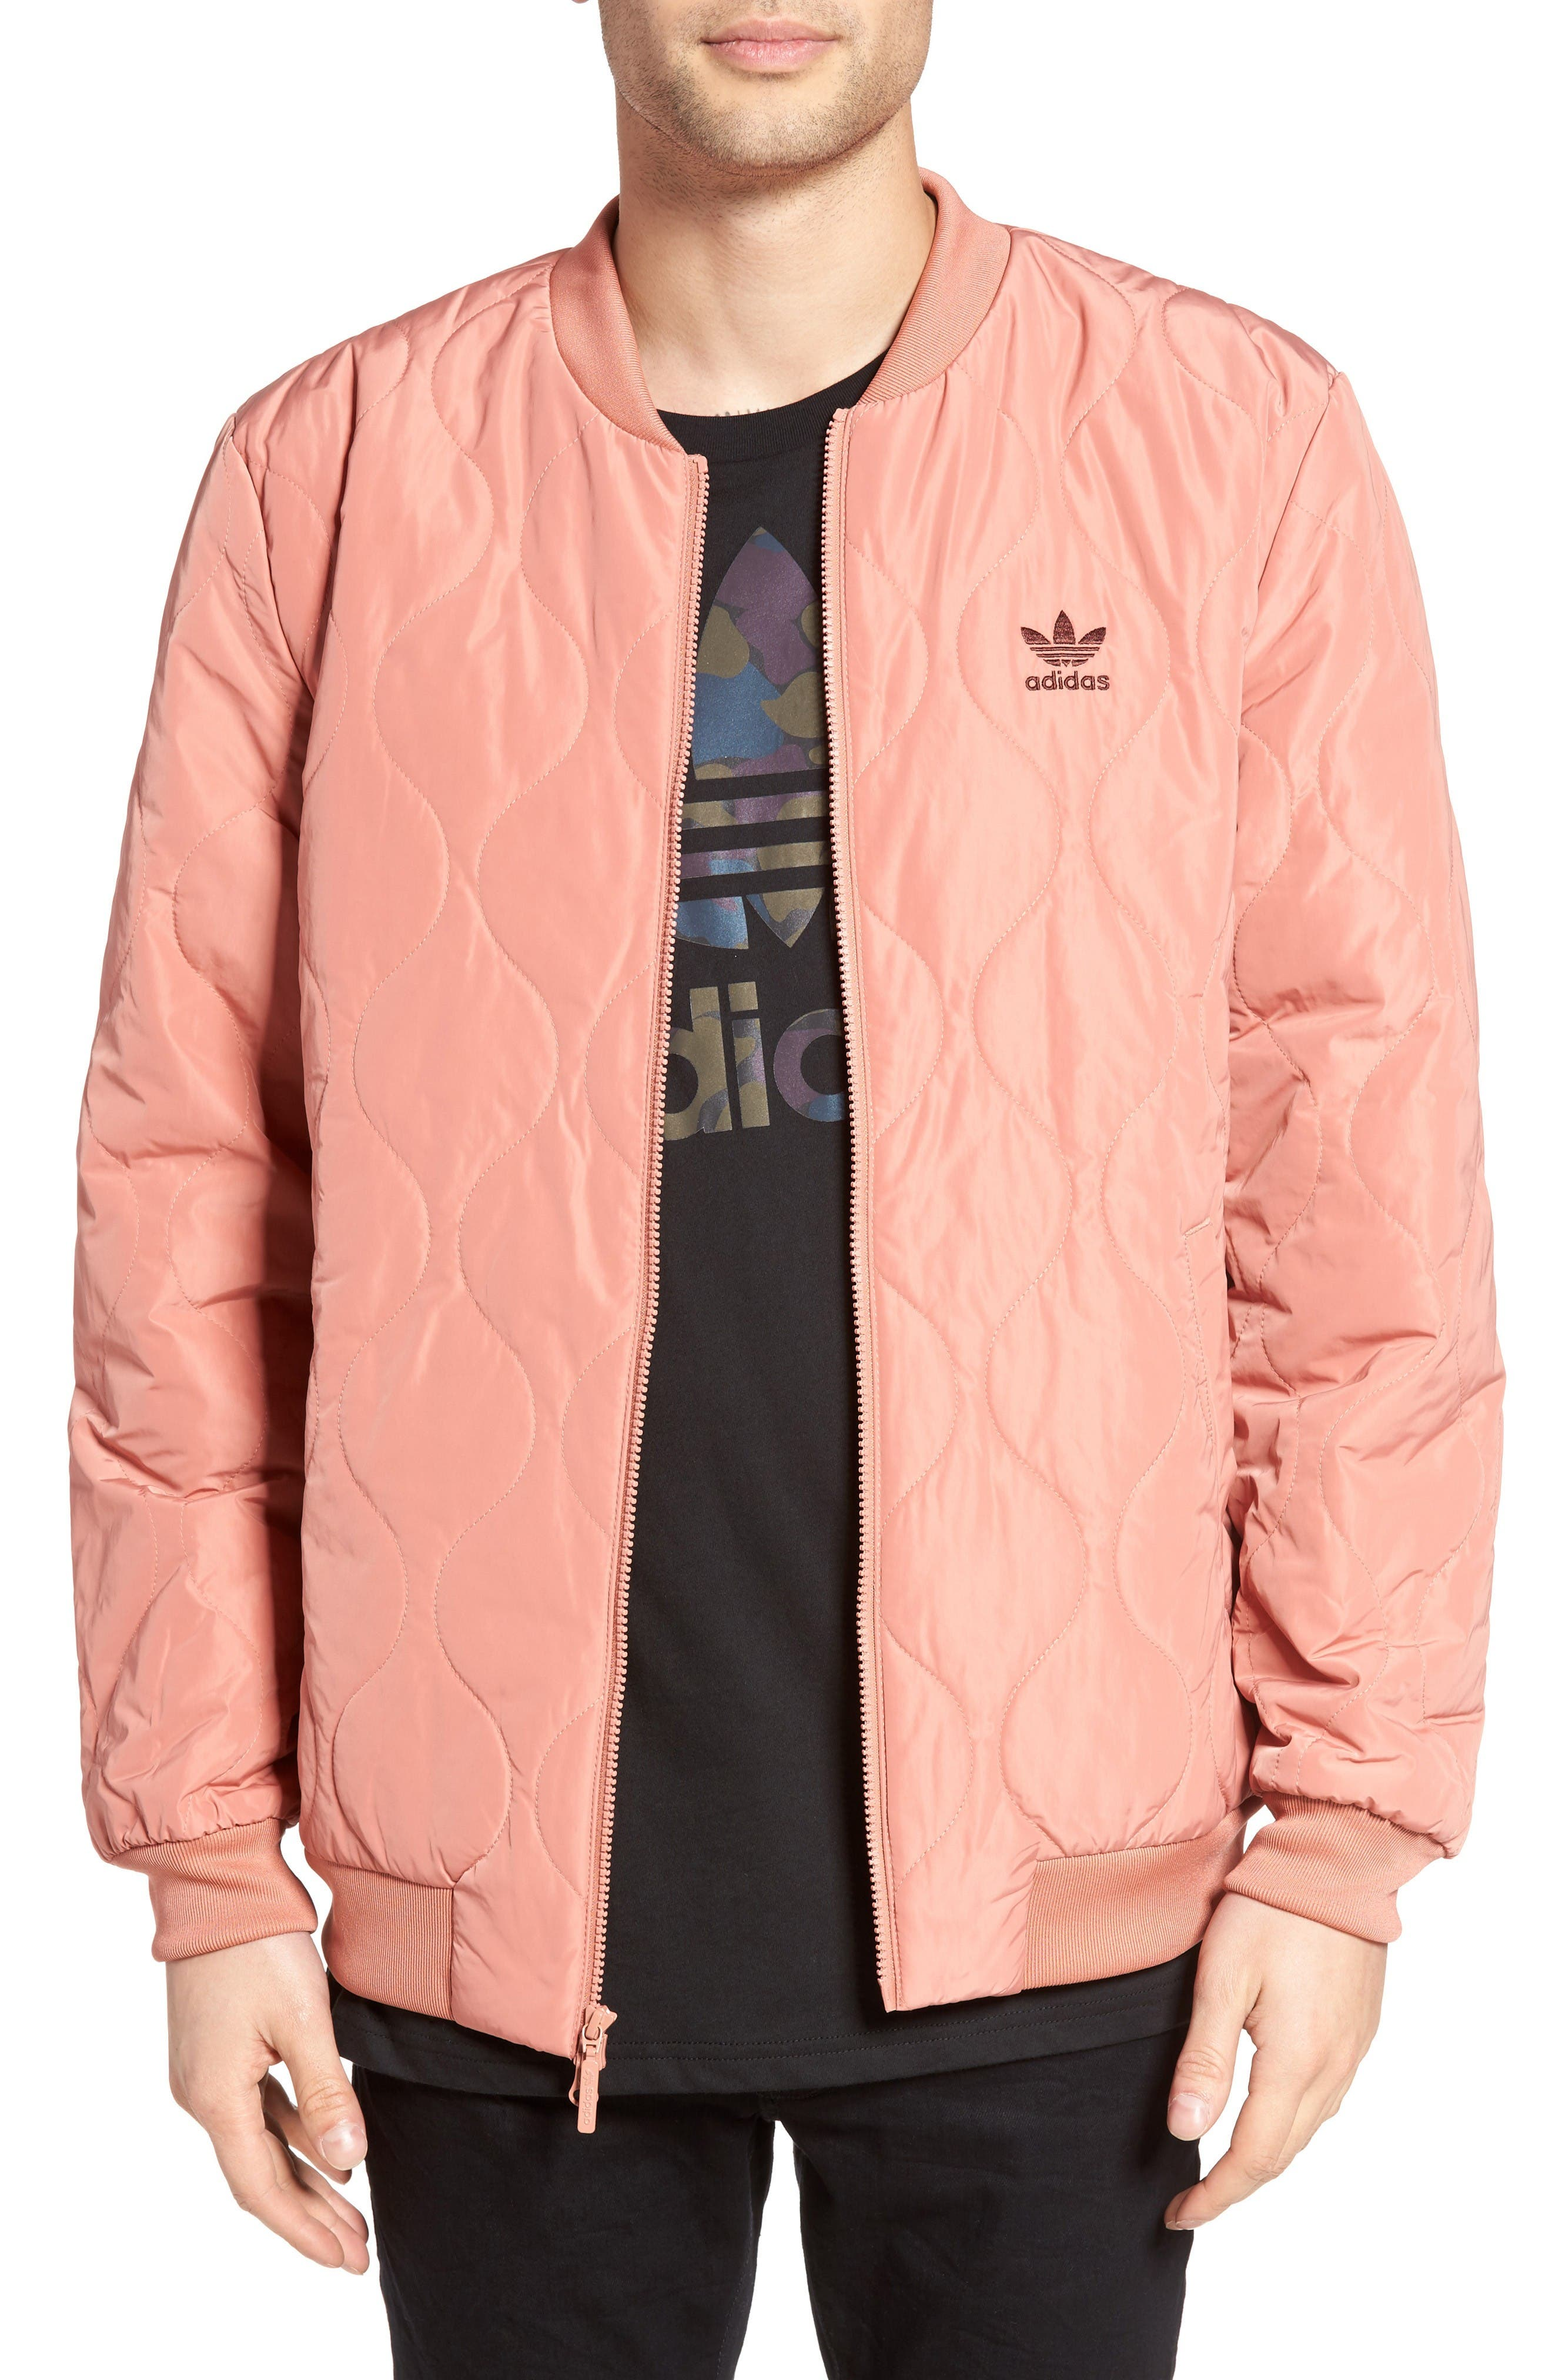 Main Image - adidas Originals Quilted Bomber Jacket